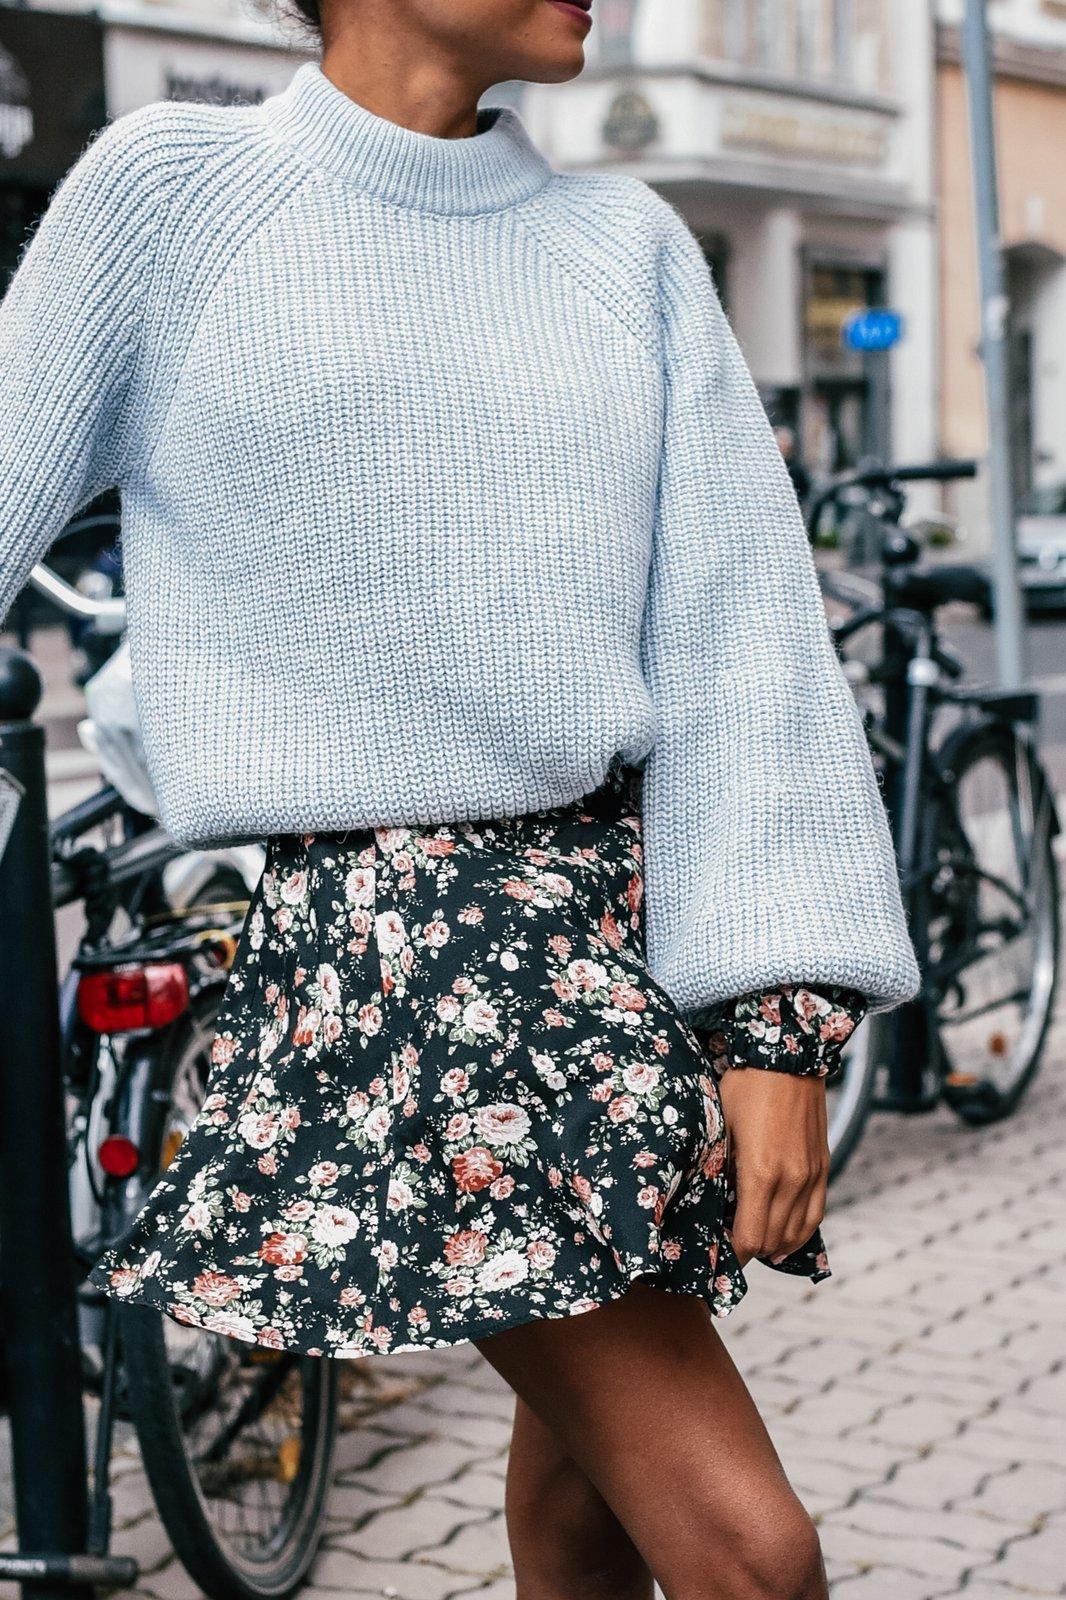 CHEAP Sasha Gray Blue Sweater 28617023885 – Women's Tops